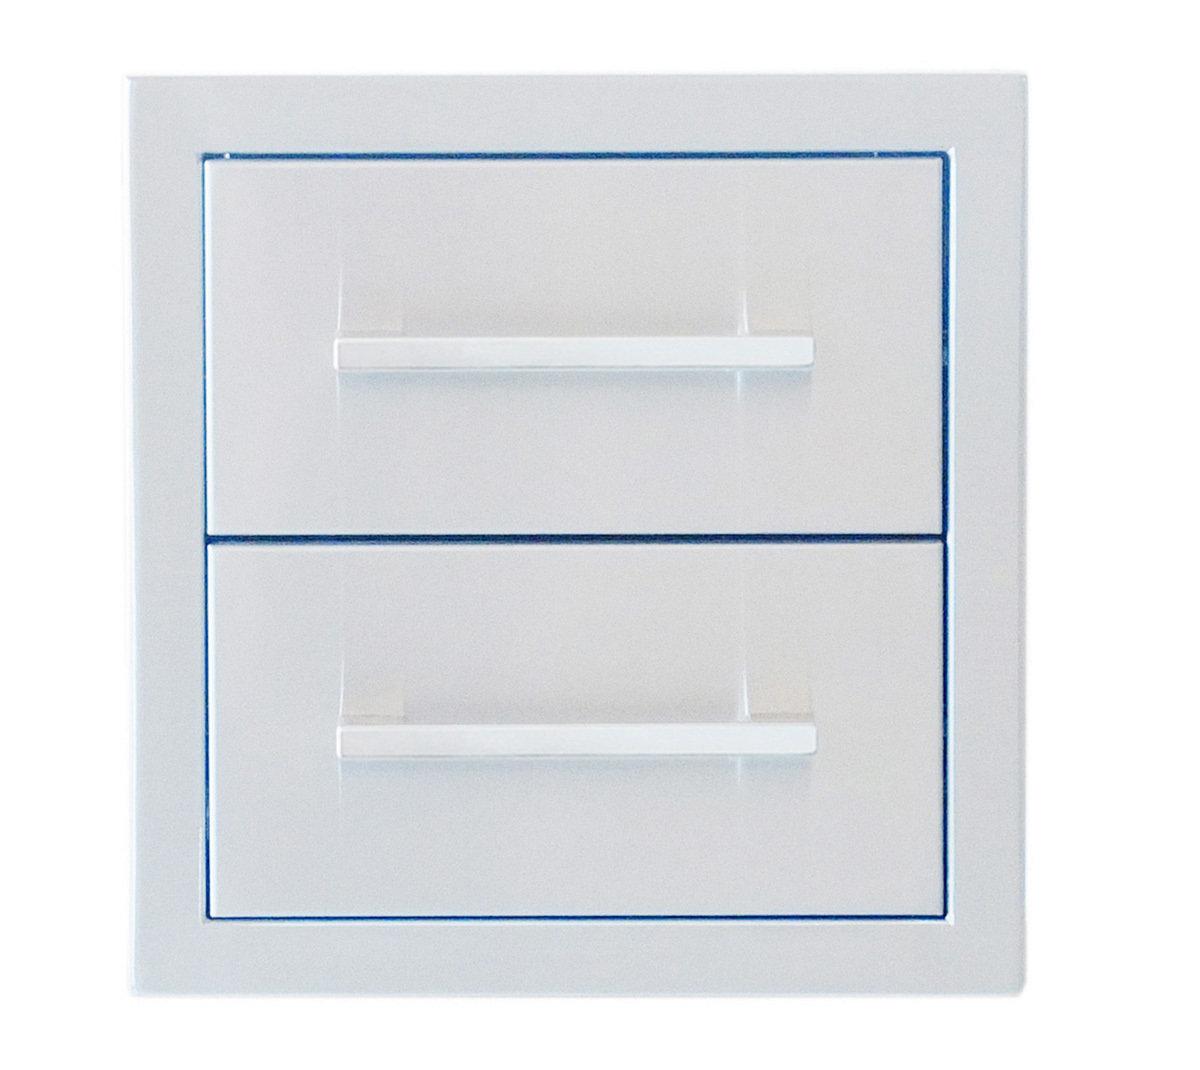 "Signature Series 12"" Beveled Frame Double Drawer - Item No. BA-DD12"